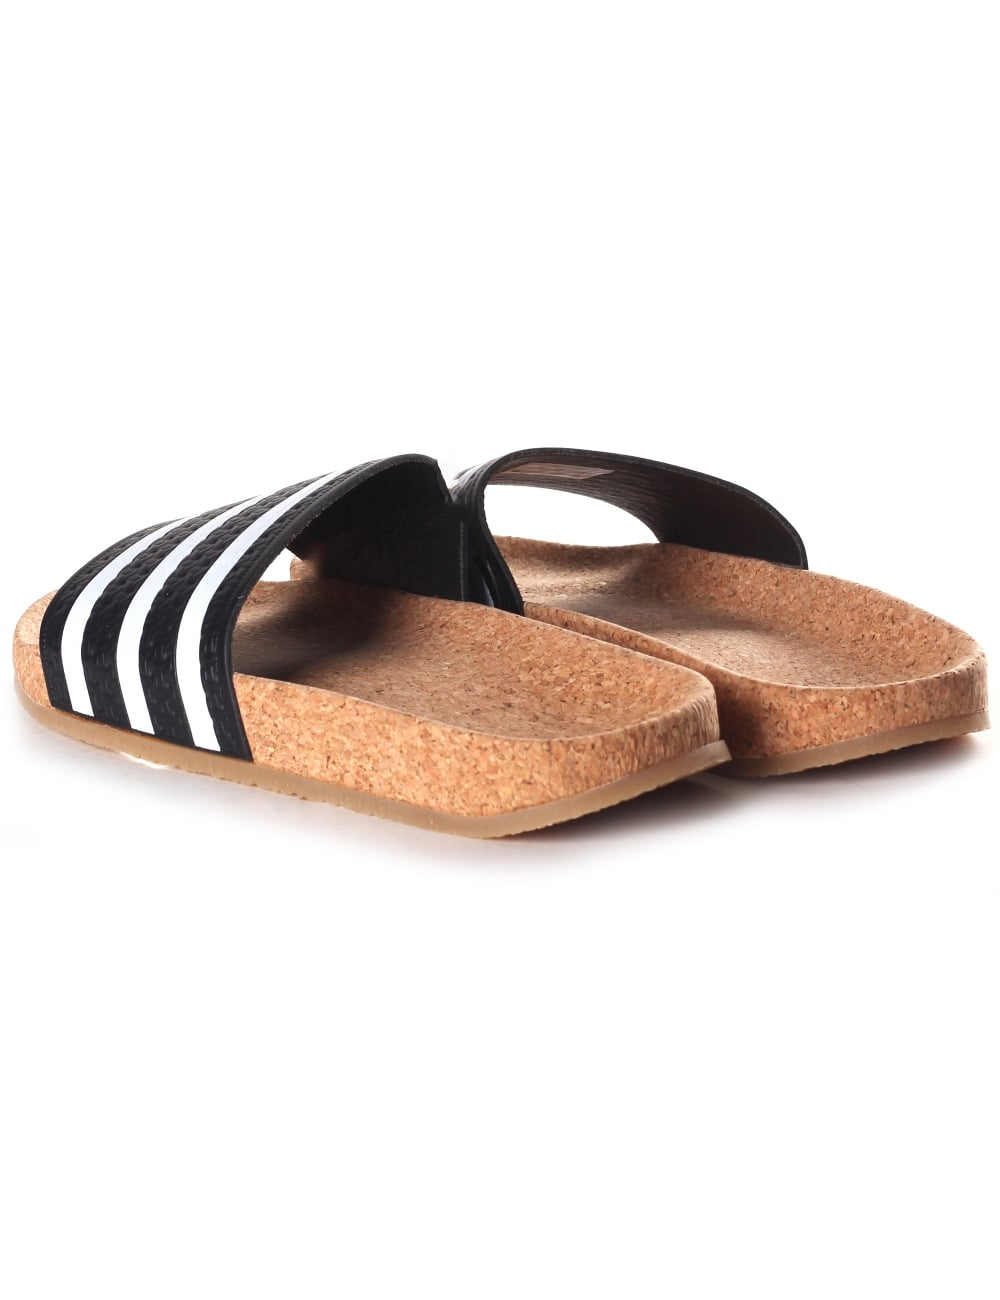 8ae308f81a1b Adidas Women s Adilette Cork Slides